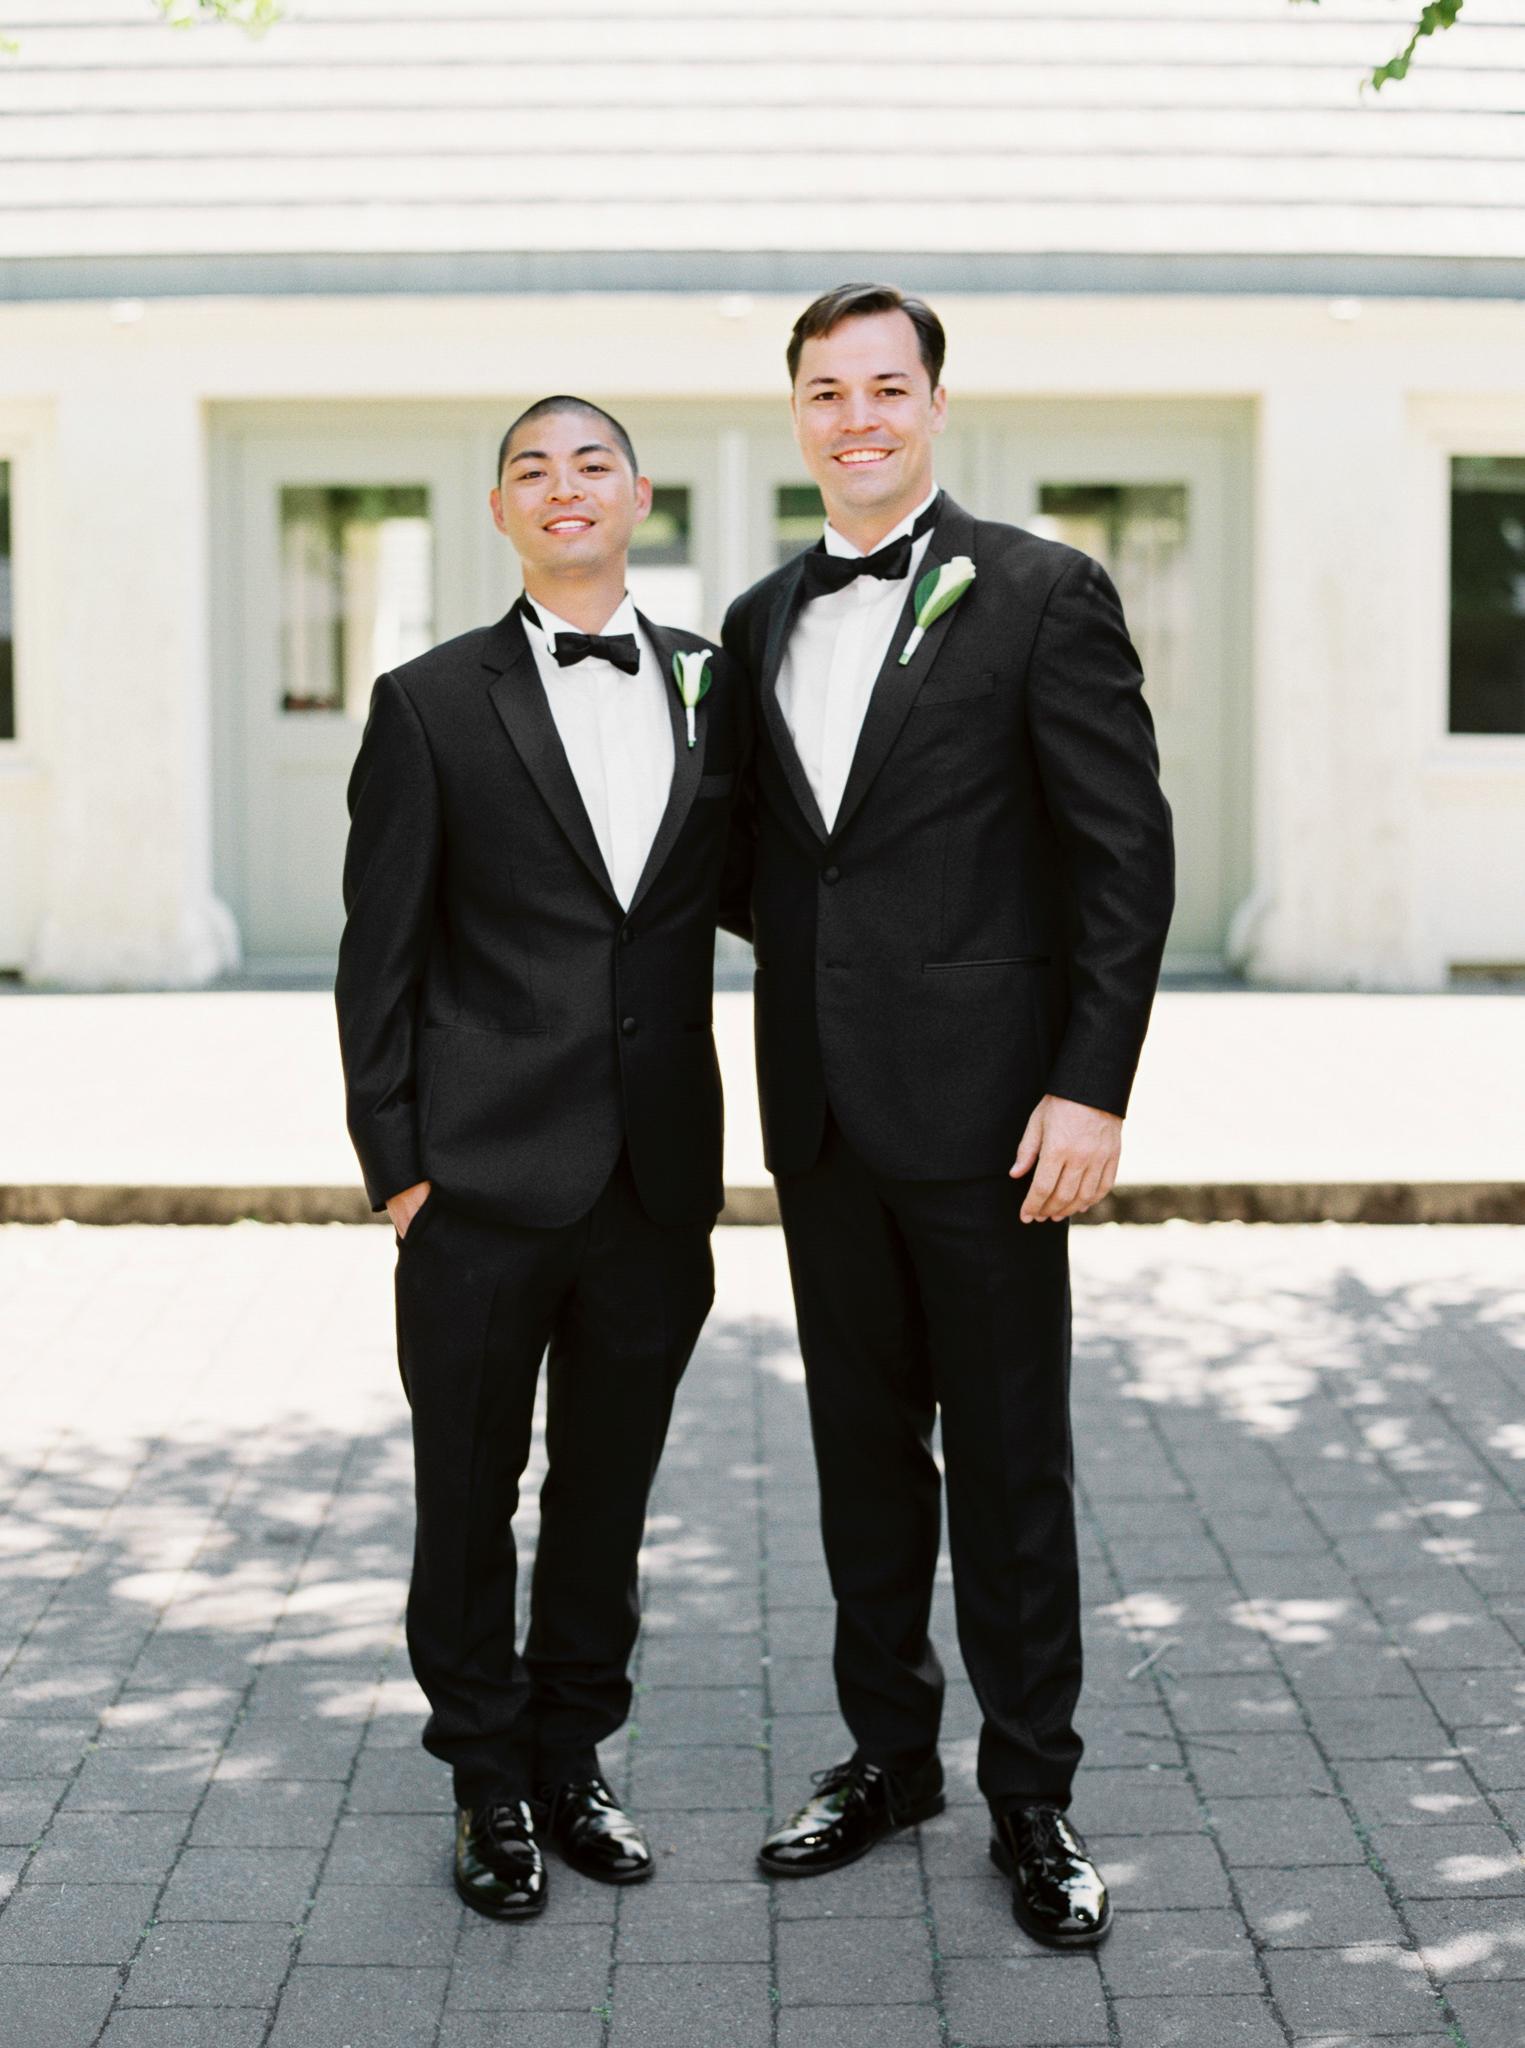 066OutliveCreative_Travel_Photographer_Videographer_Lewis&Clark_Oregon_Elegant_BlackTie_Destination_Wedding.jpg